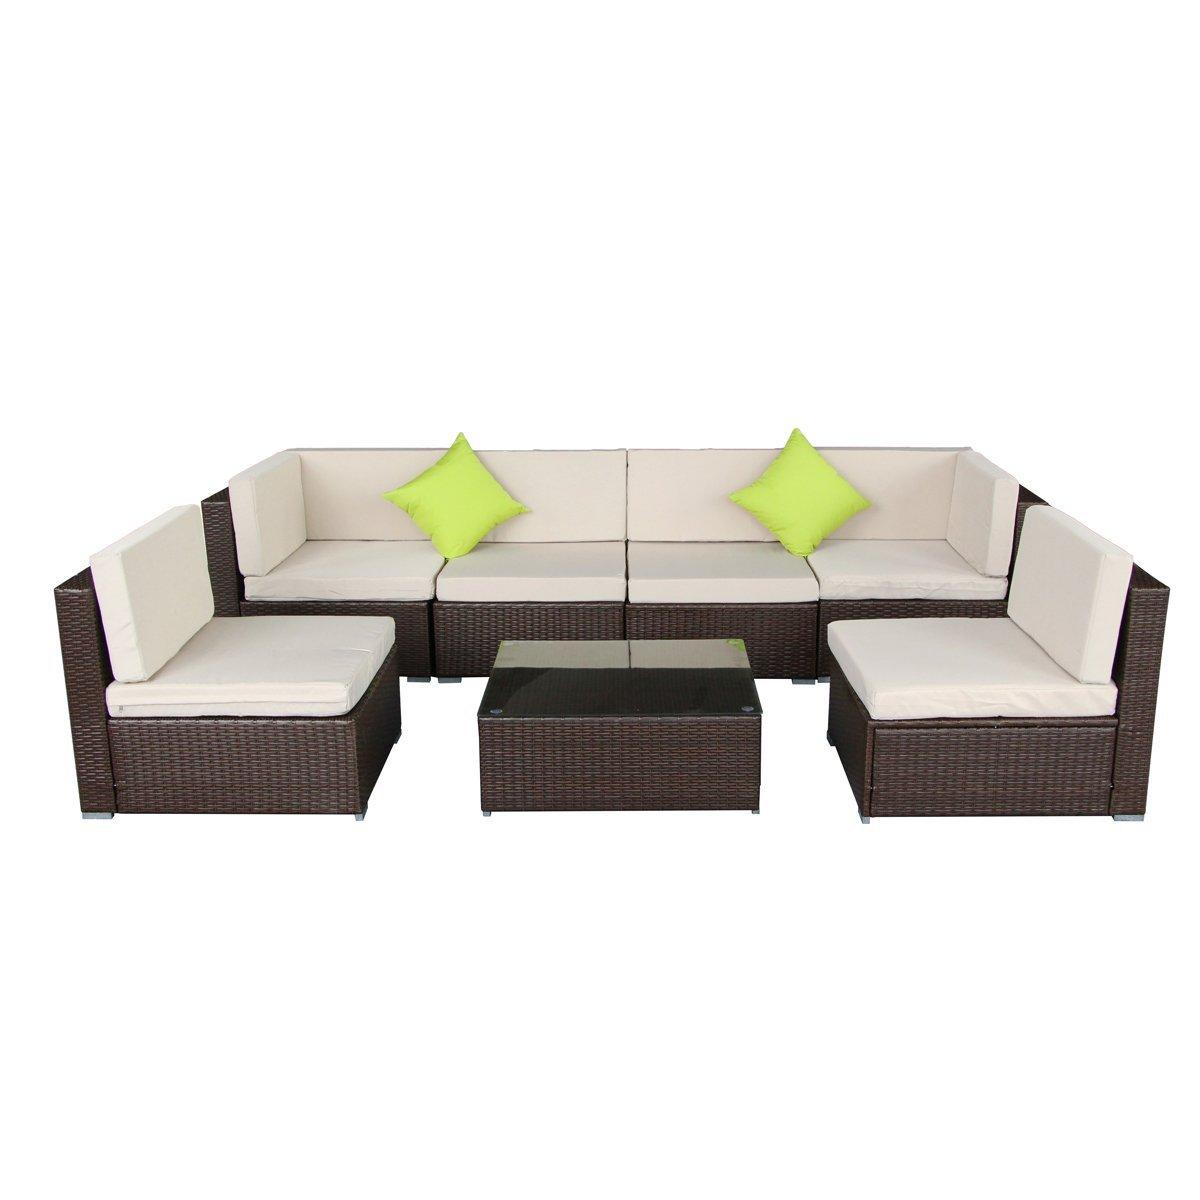 Outdoor Sectional Couch Decor Ideasdecor Ideas